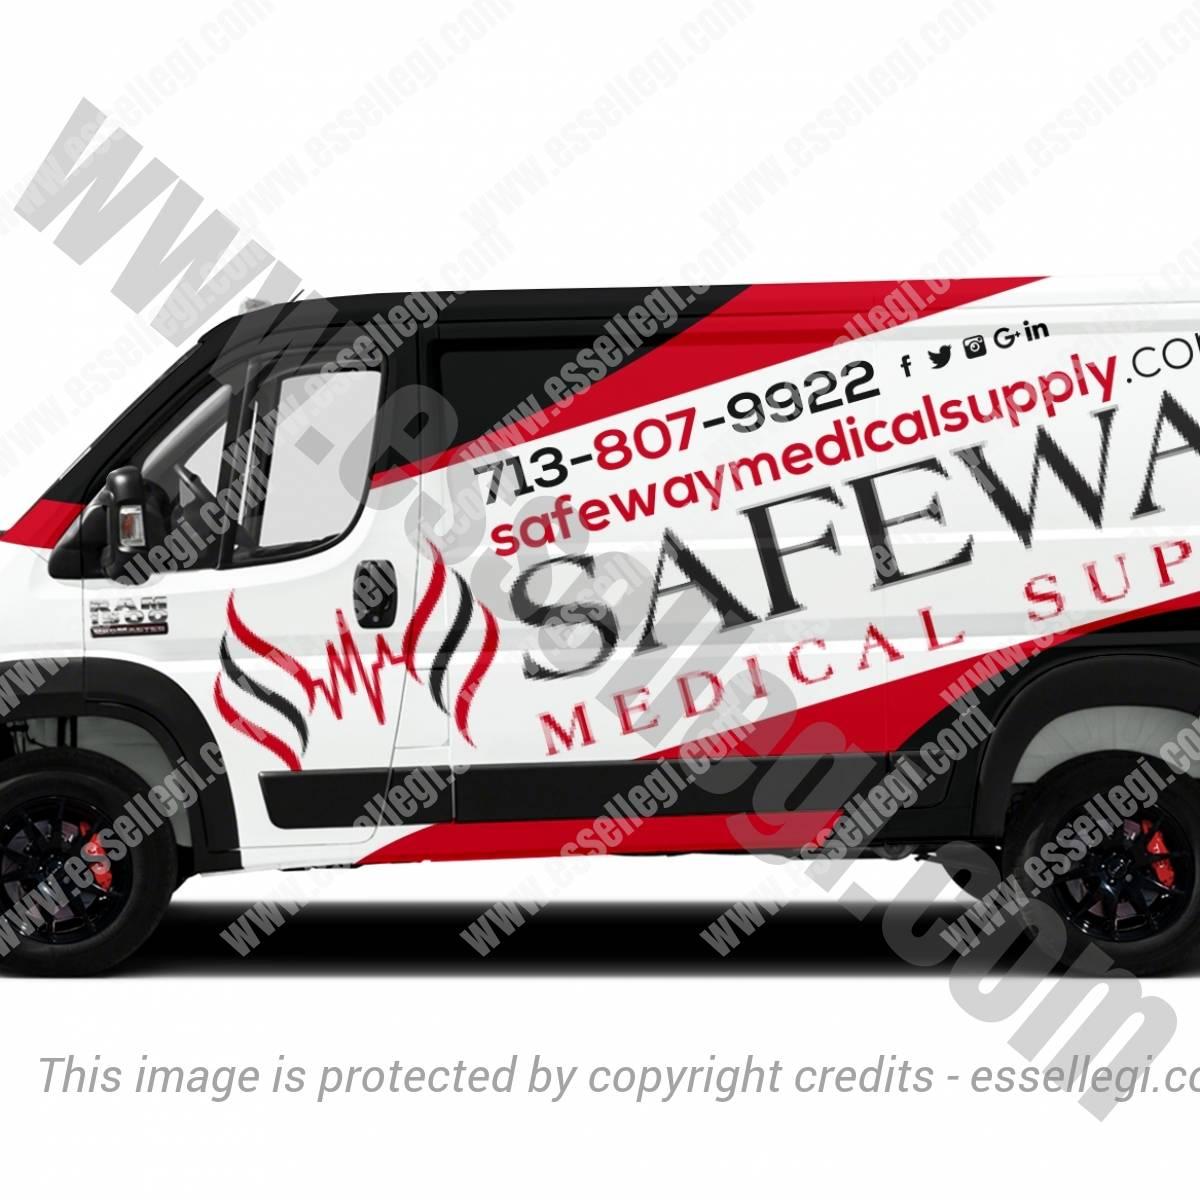 SAFEWAY – MEDICAL SUPPLY | VAN WRAP DESIGN 🇺🇸